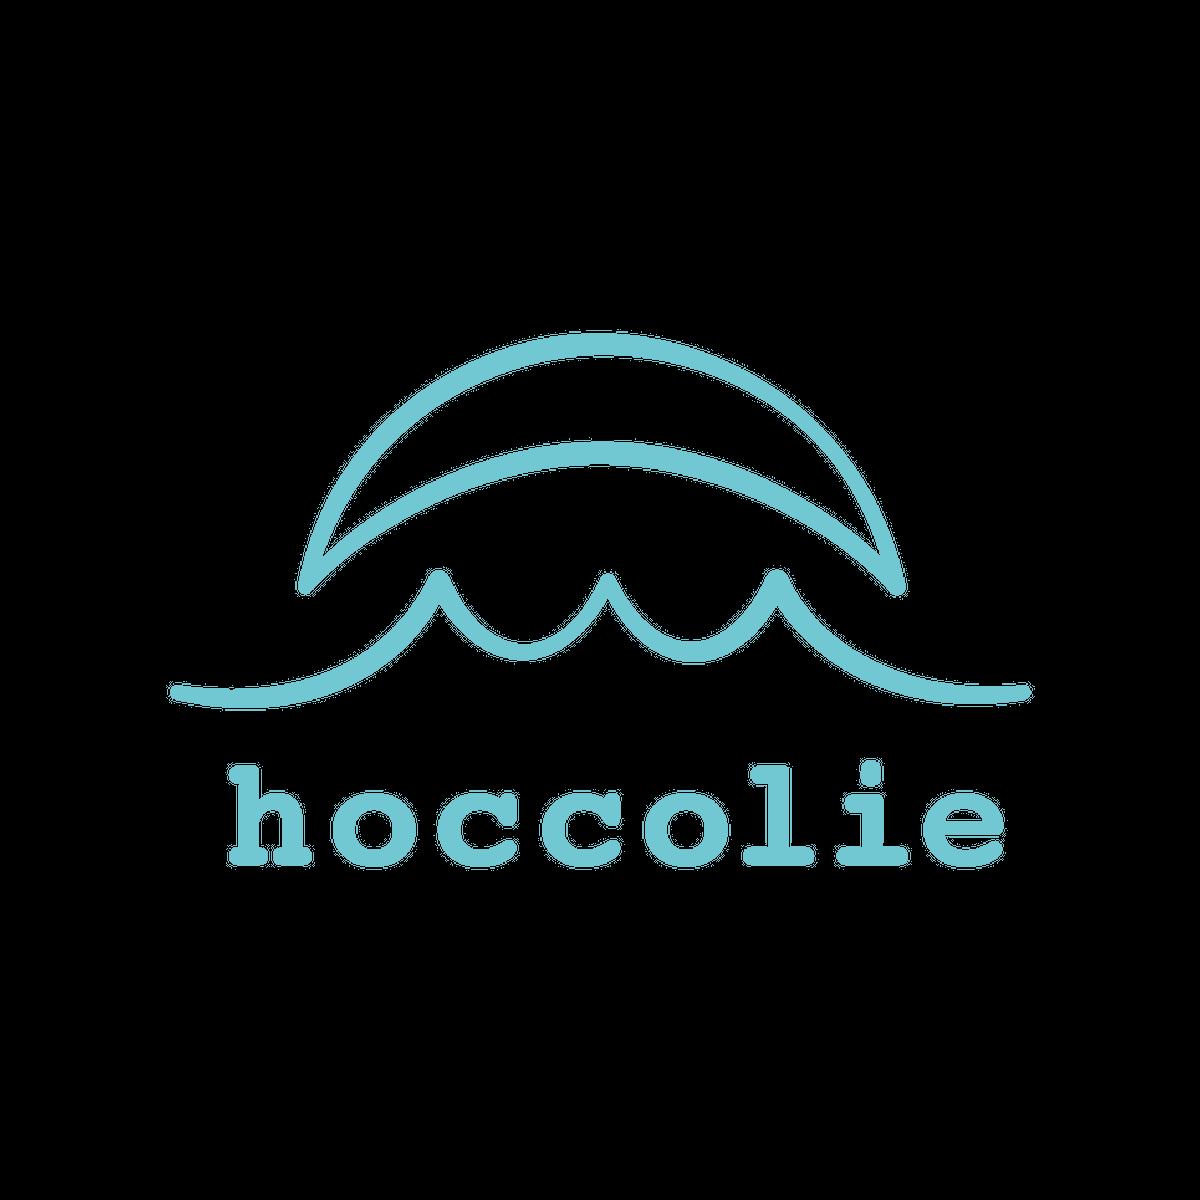 hoccolie(ほっこりえ) powered by BASE